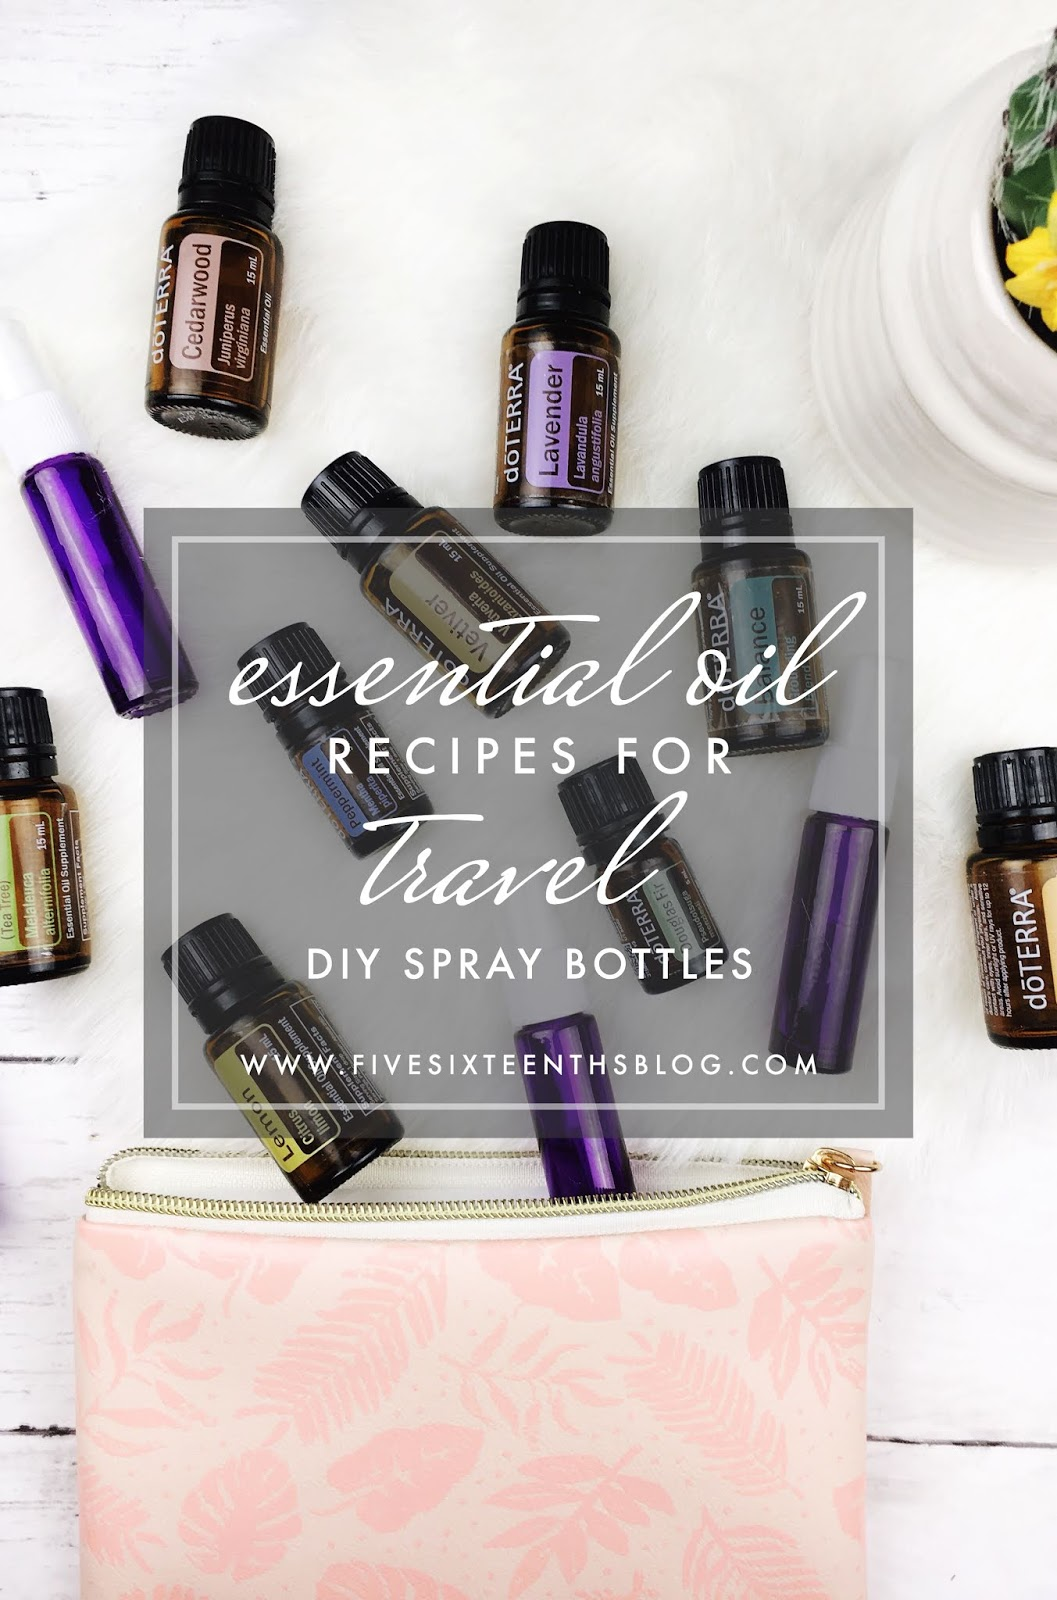 five sixteenths blog: Make it Monday // DIY Essential Oil Recipes